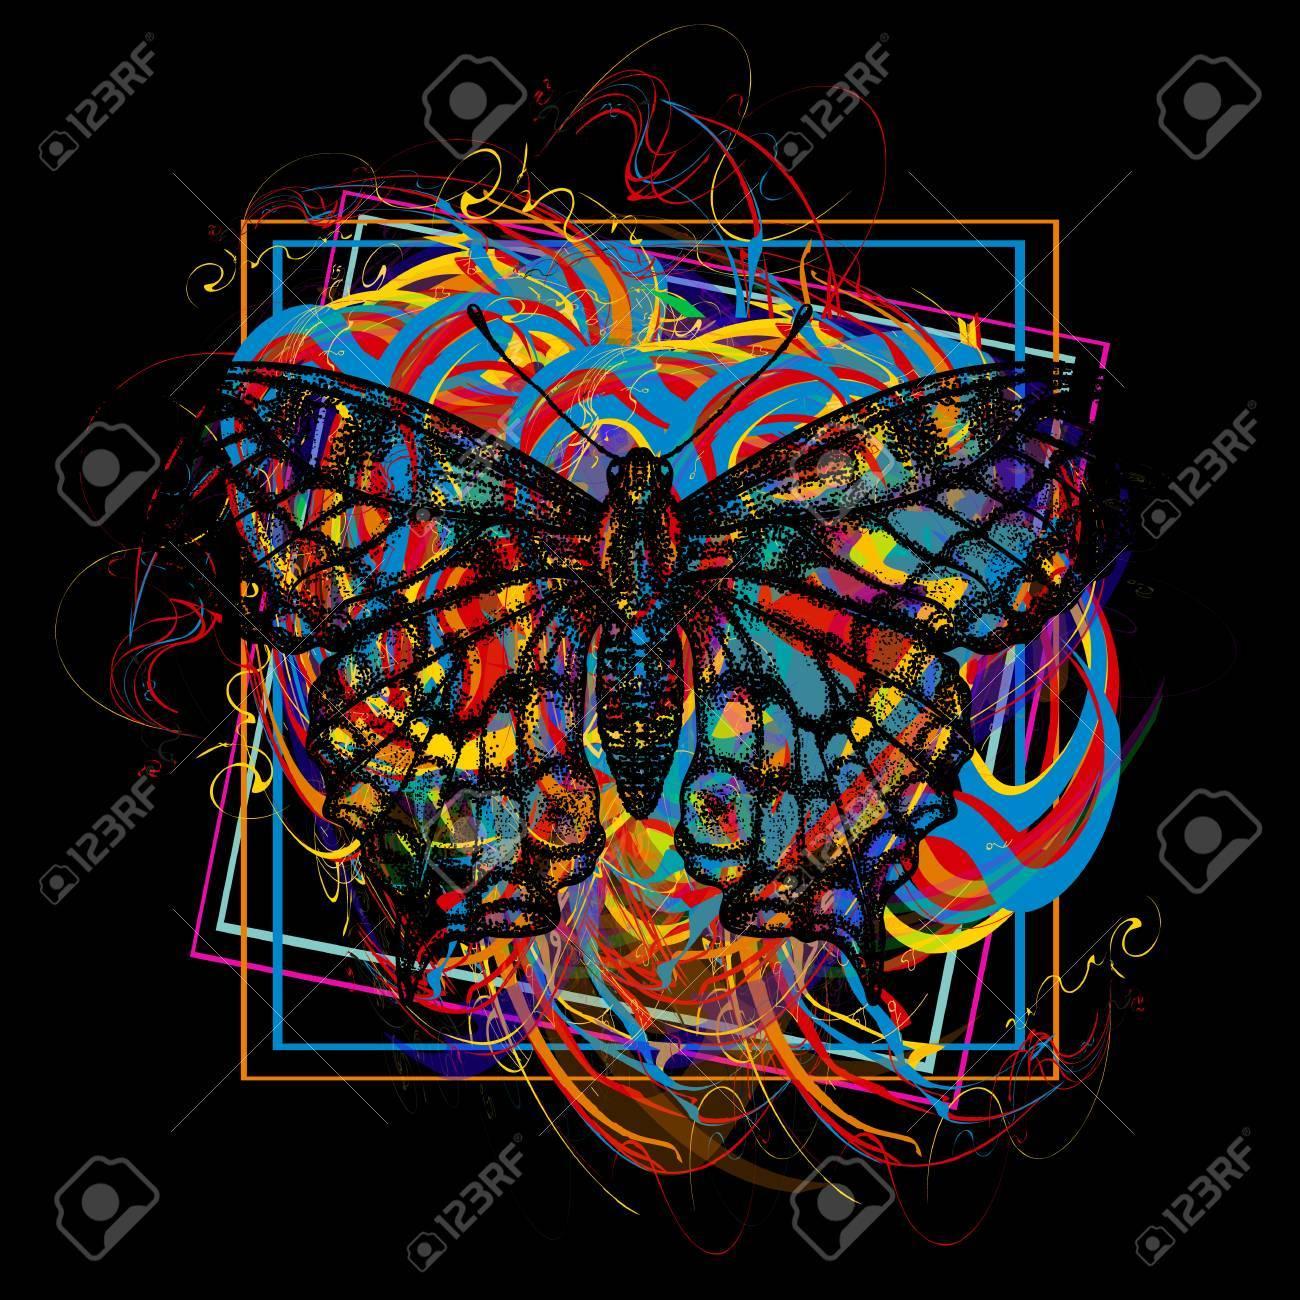 Color butterfly t-shirt design modern art element for design, poster, gift cards, flyers, brochures template. - 80497204